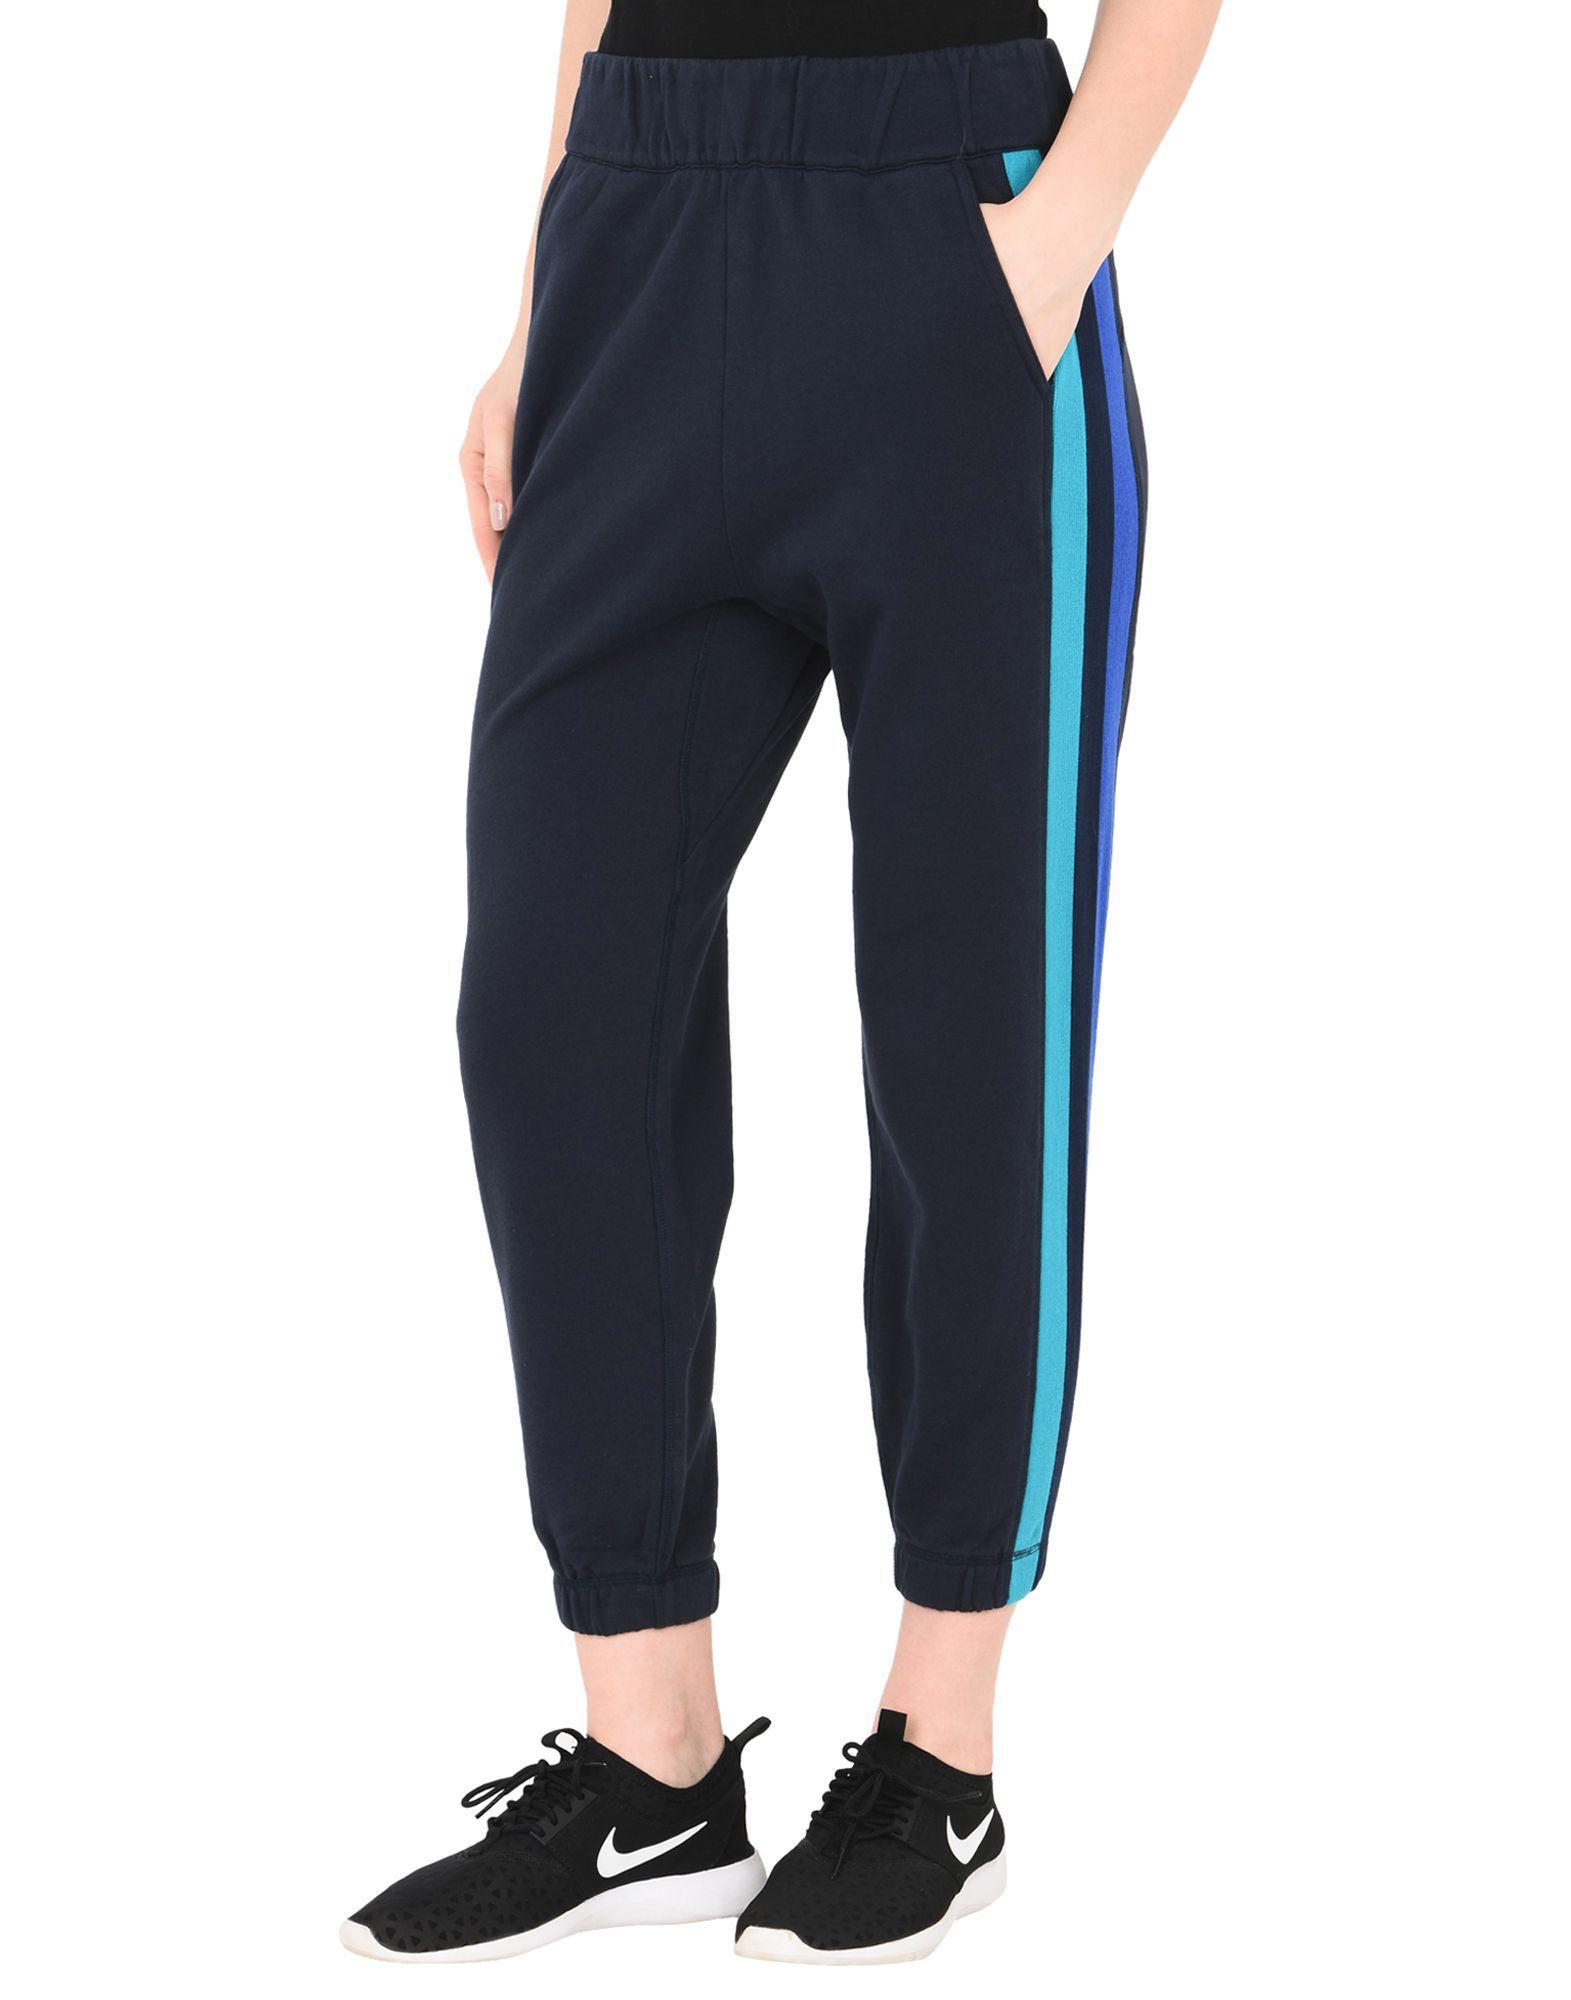 Les Pantalons - 3/4 Pantalons Longs Lndr bPufNFd